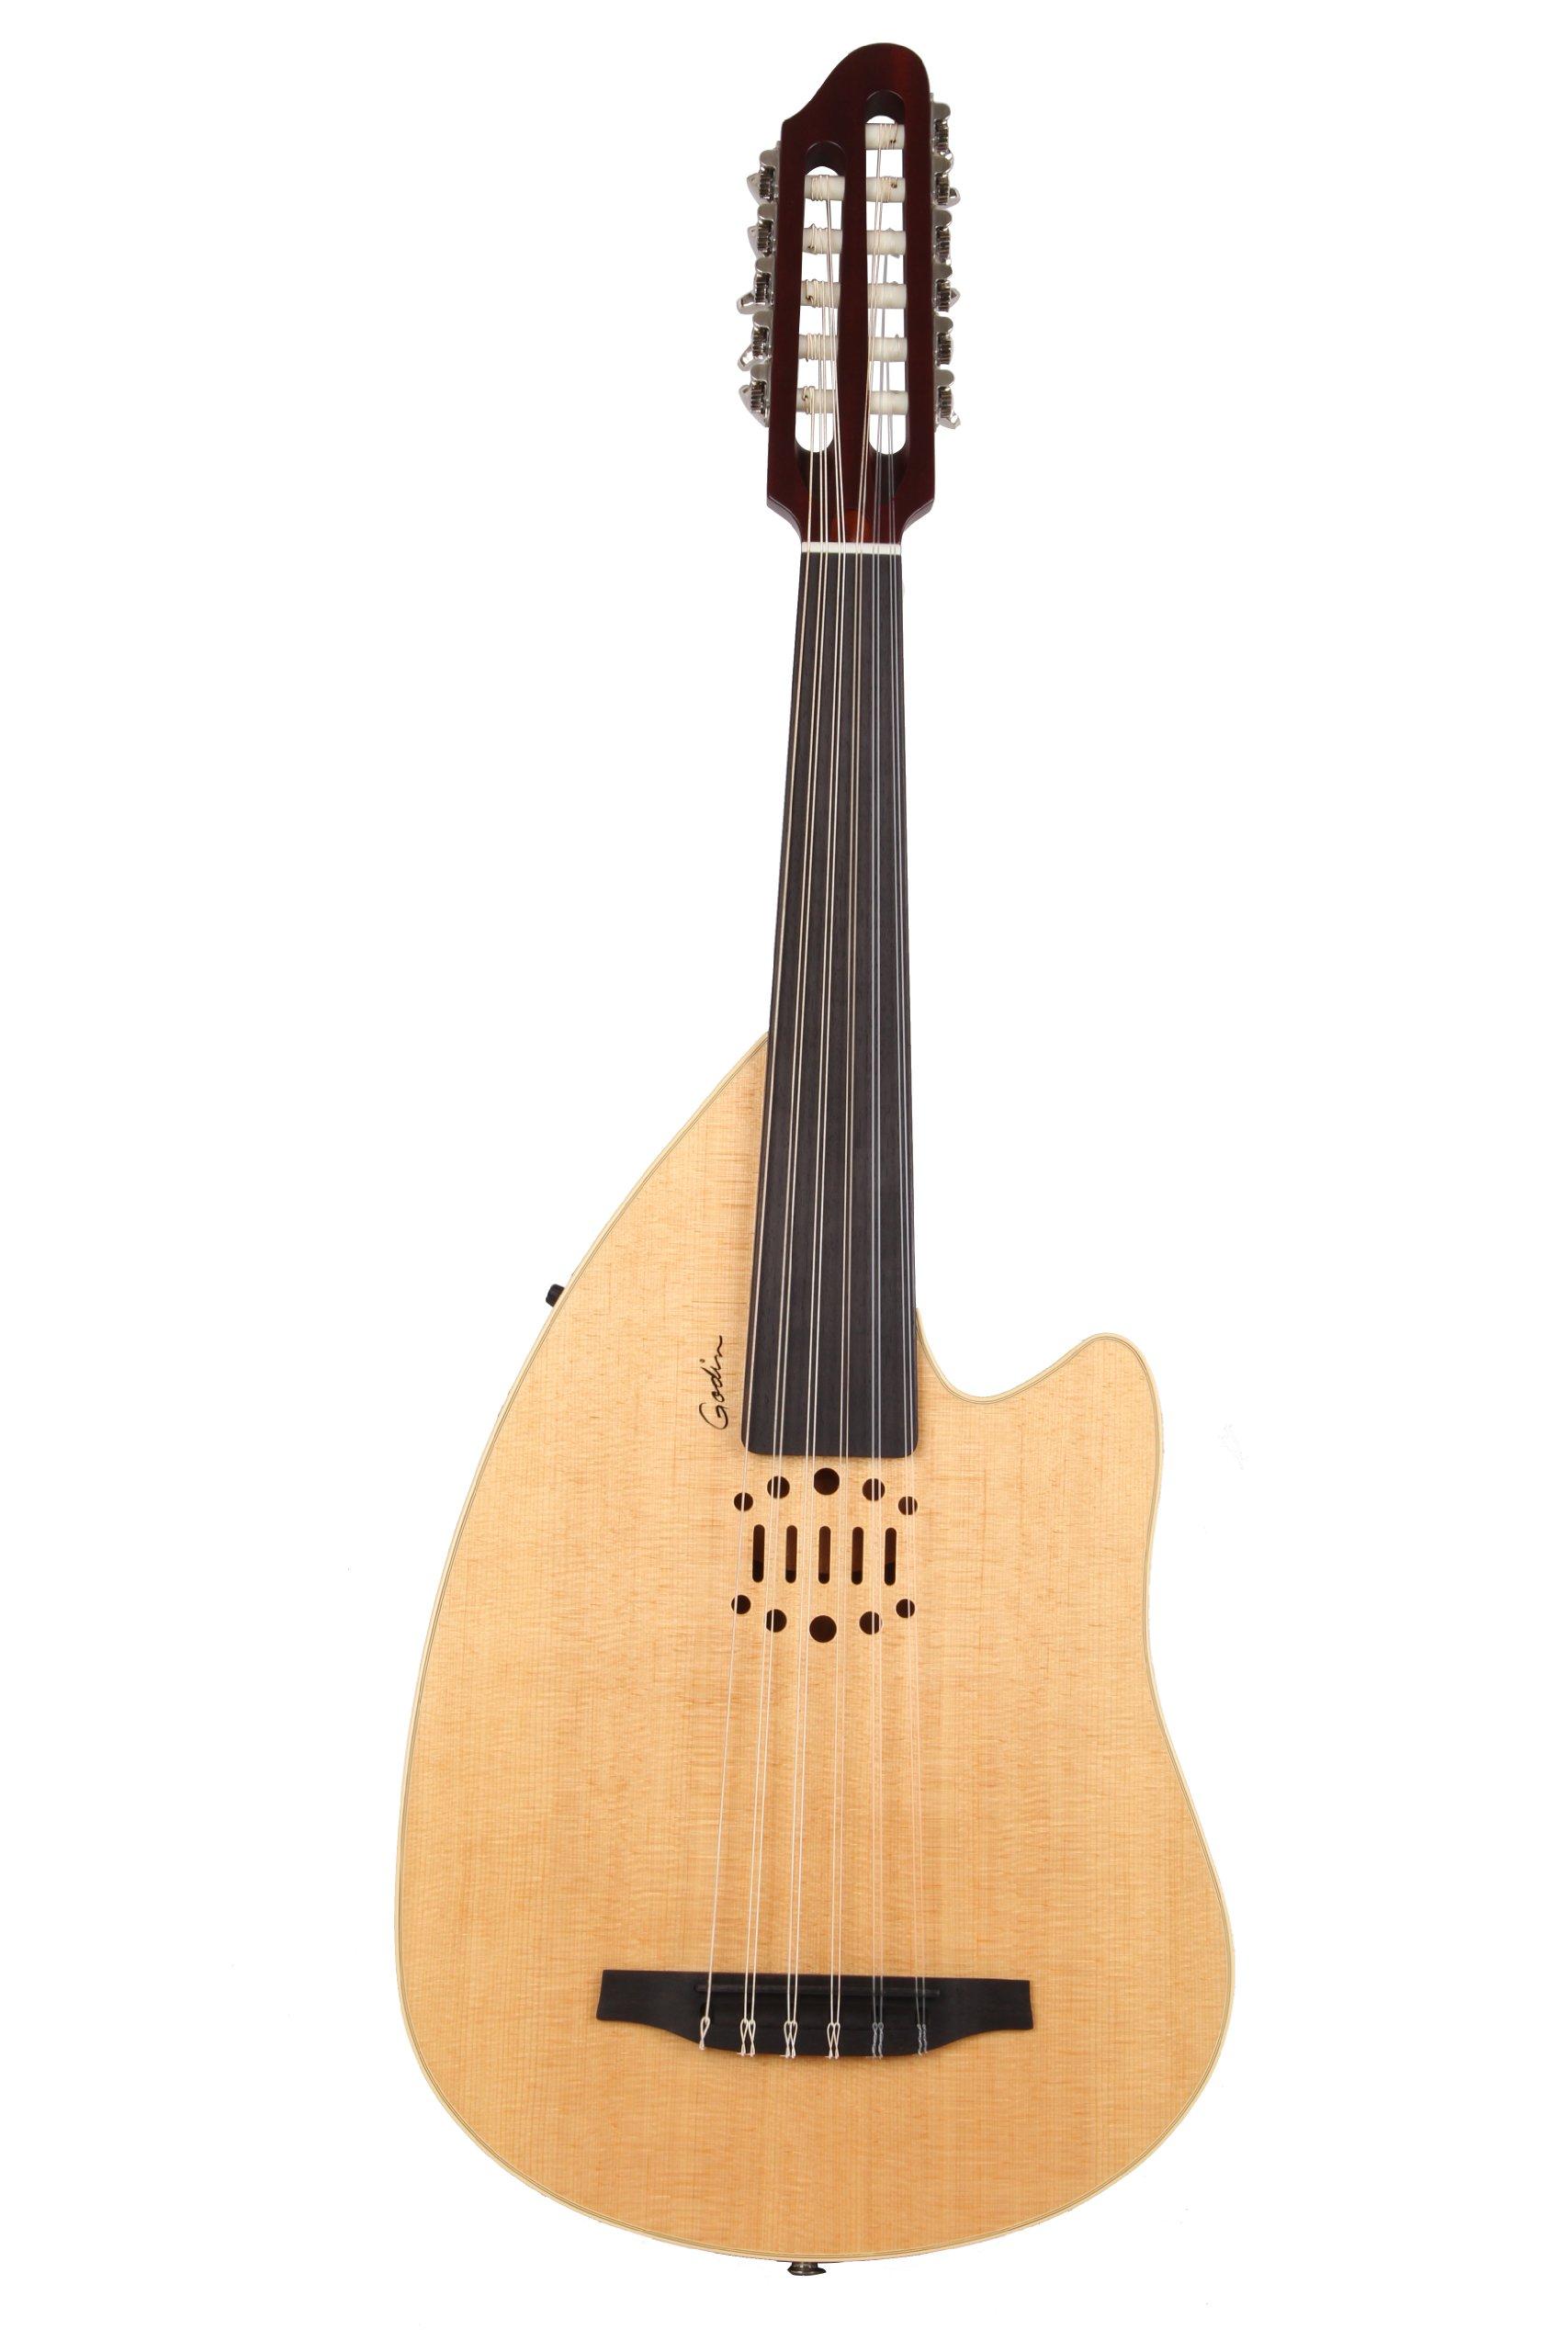 godin guitars multi oud series 035014 10 strings hollow body electric guitar natural hg. Black Bedroom Furniture Sets. Home Design Ideas